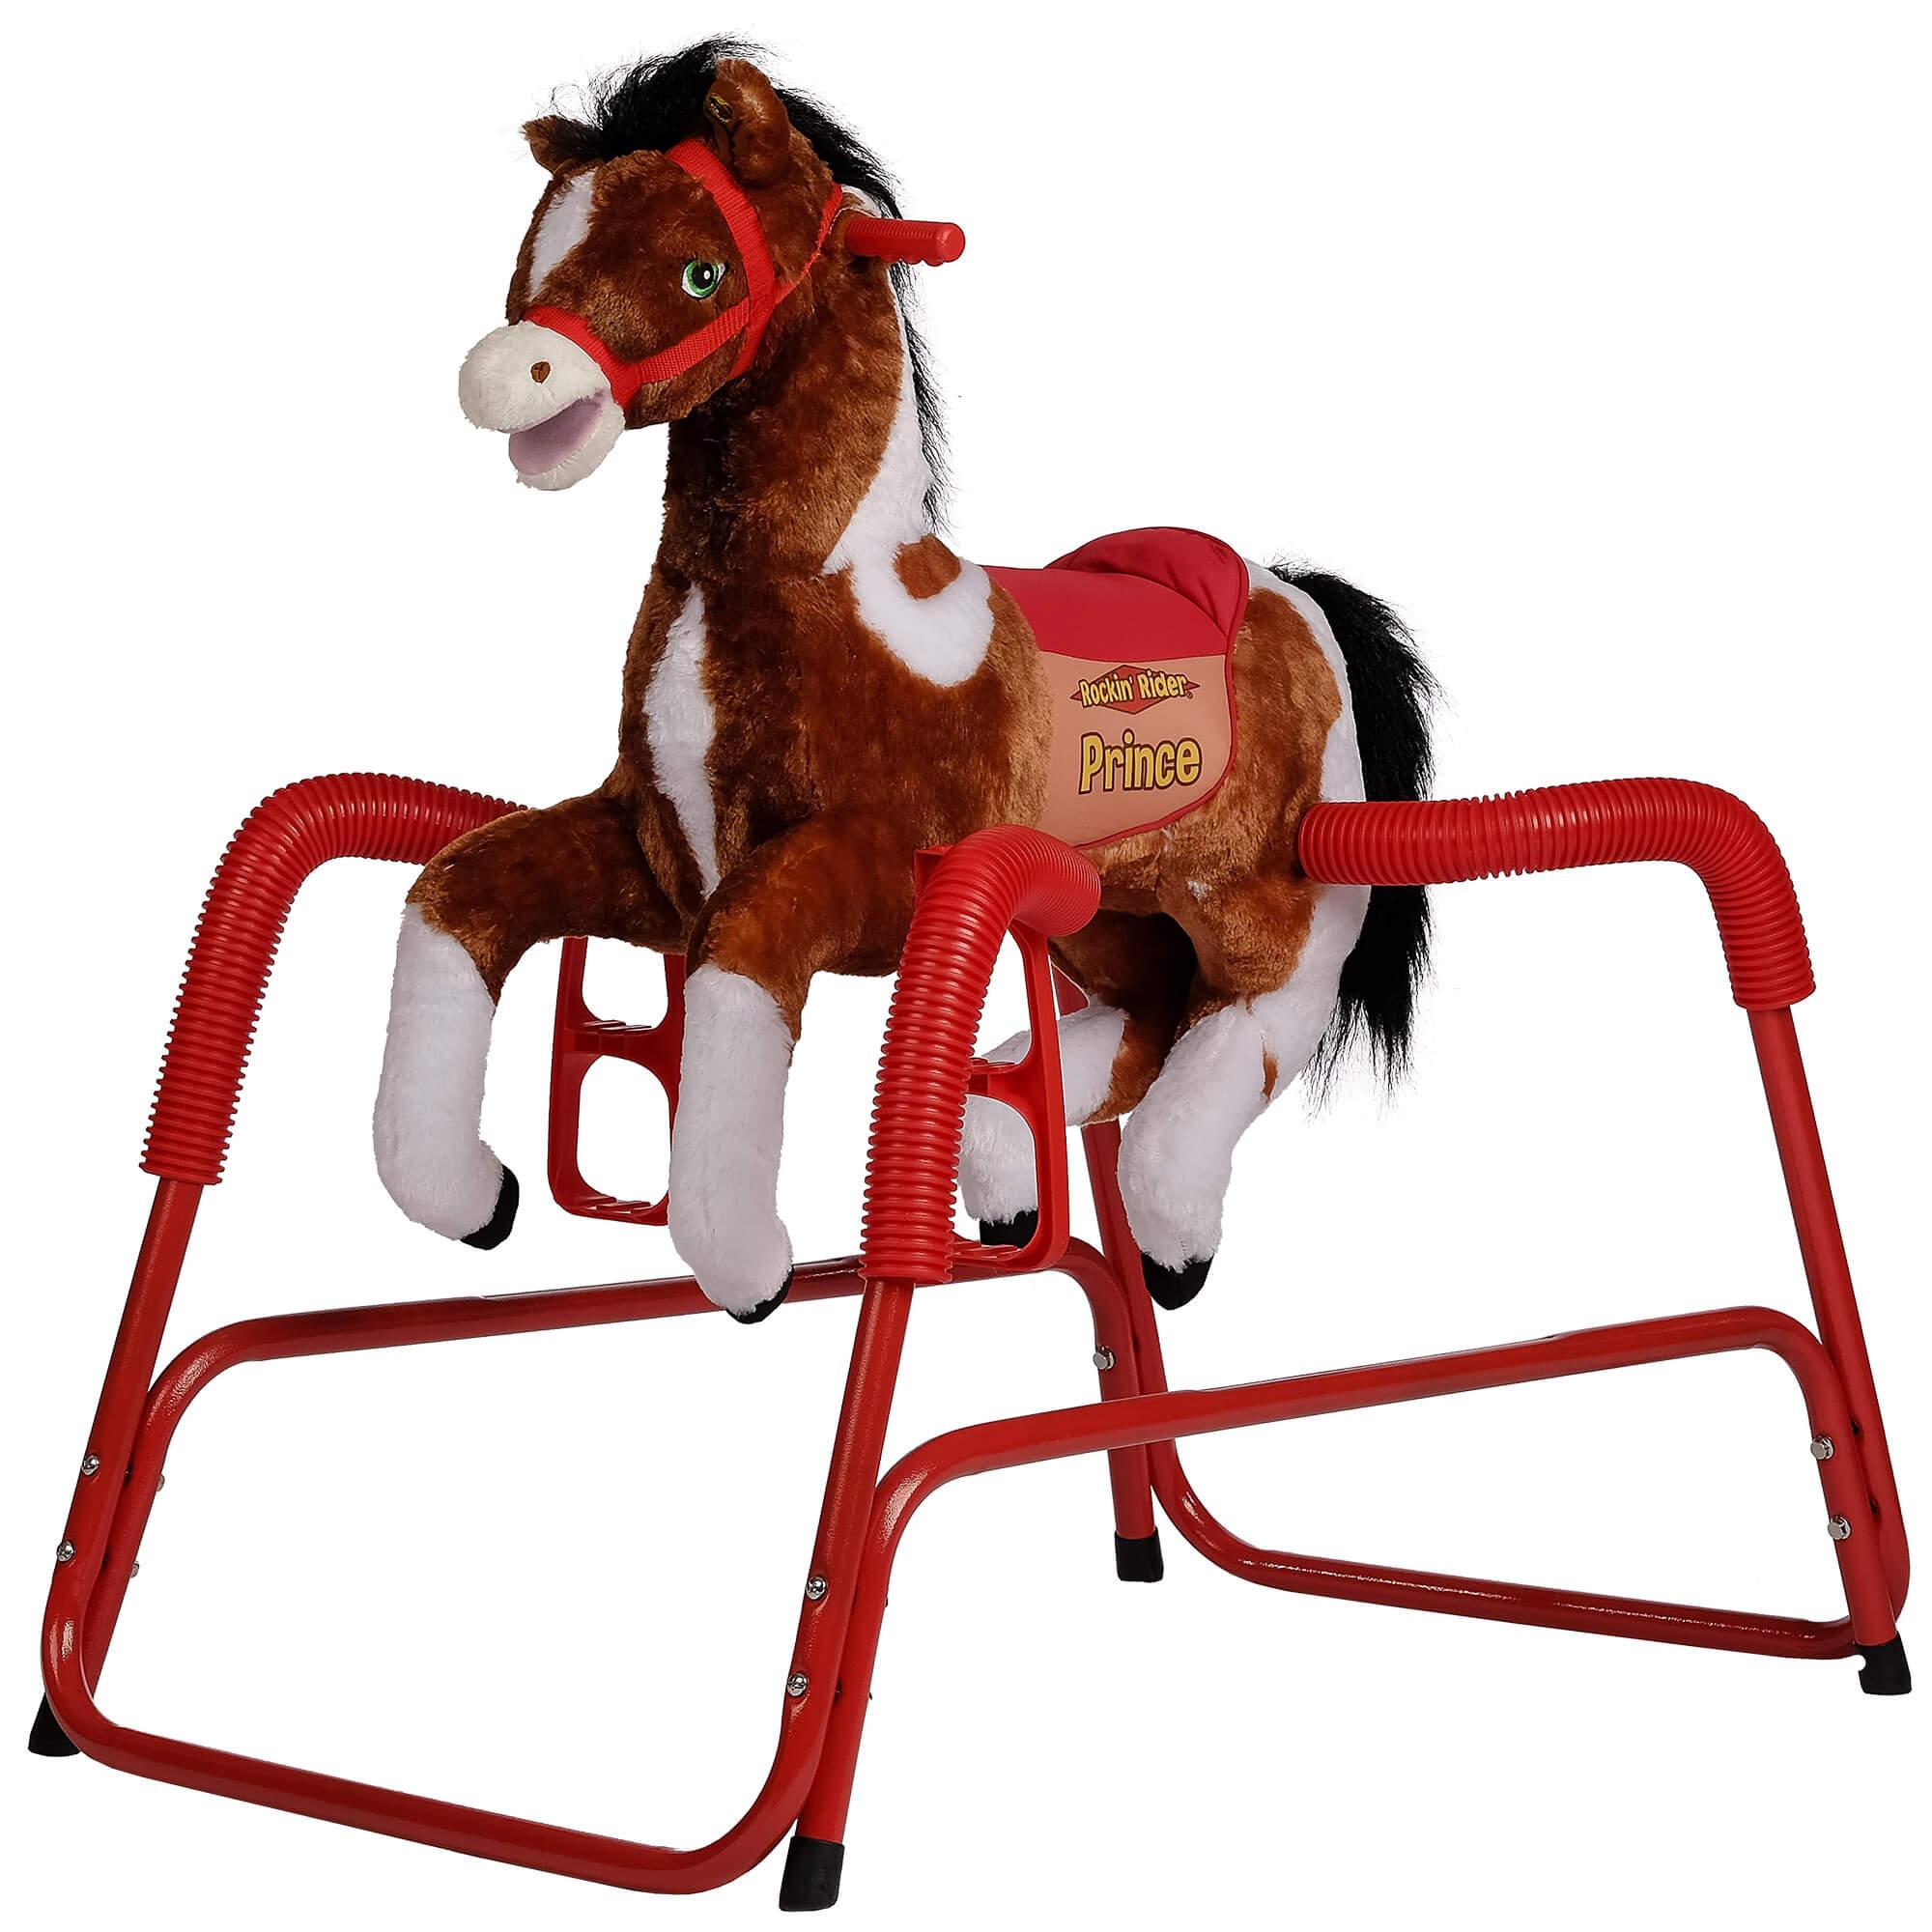 Prince Spring Horse – My Rockin' Rider Shop